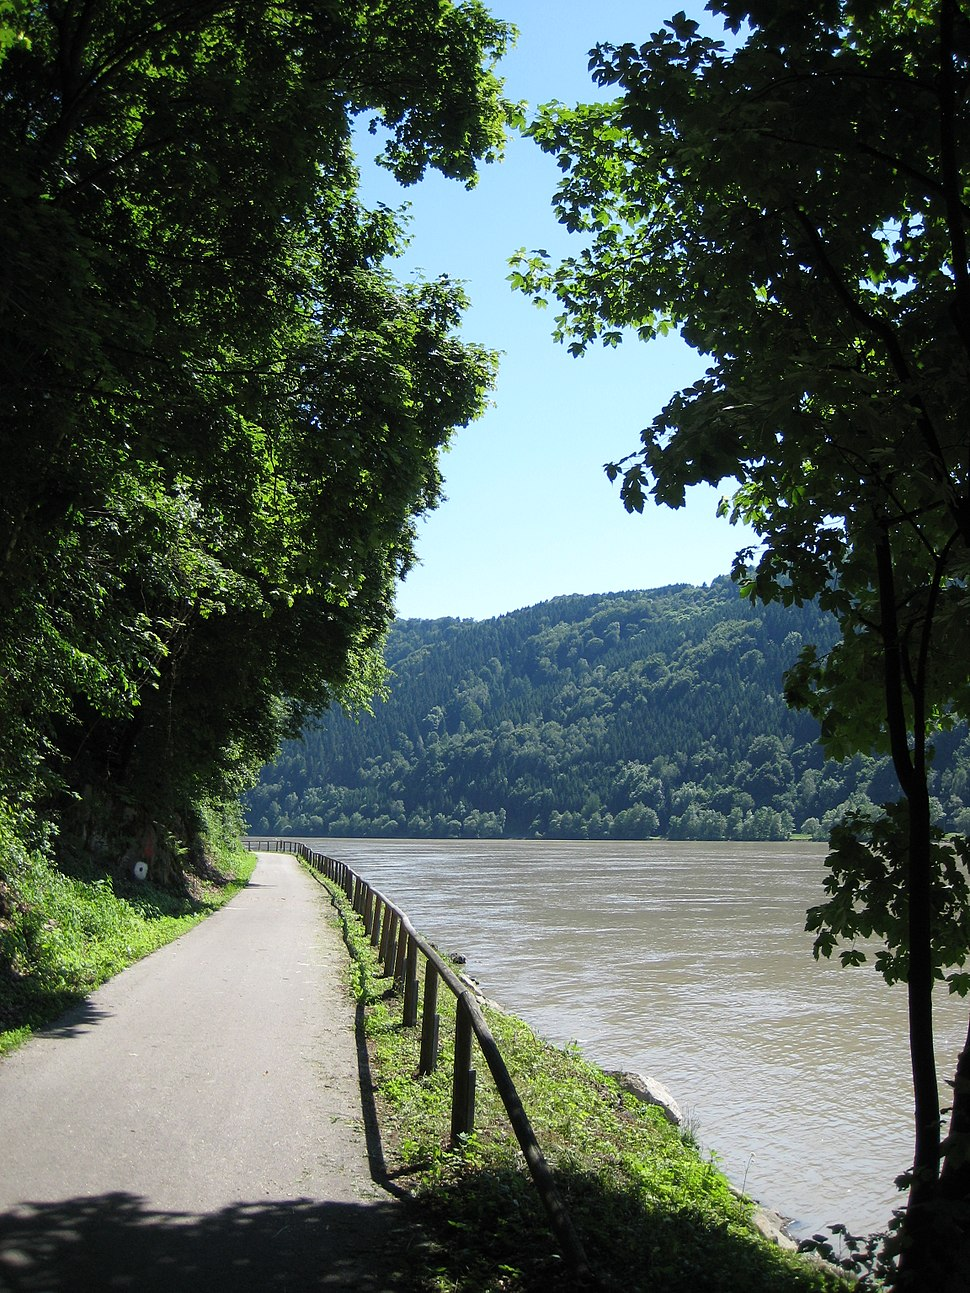 Donauradweg Schloegener Schlinge - Aschach